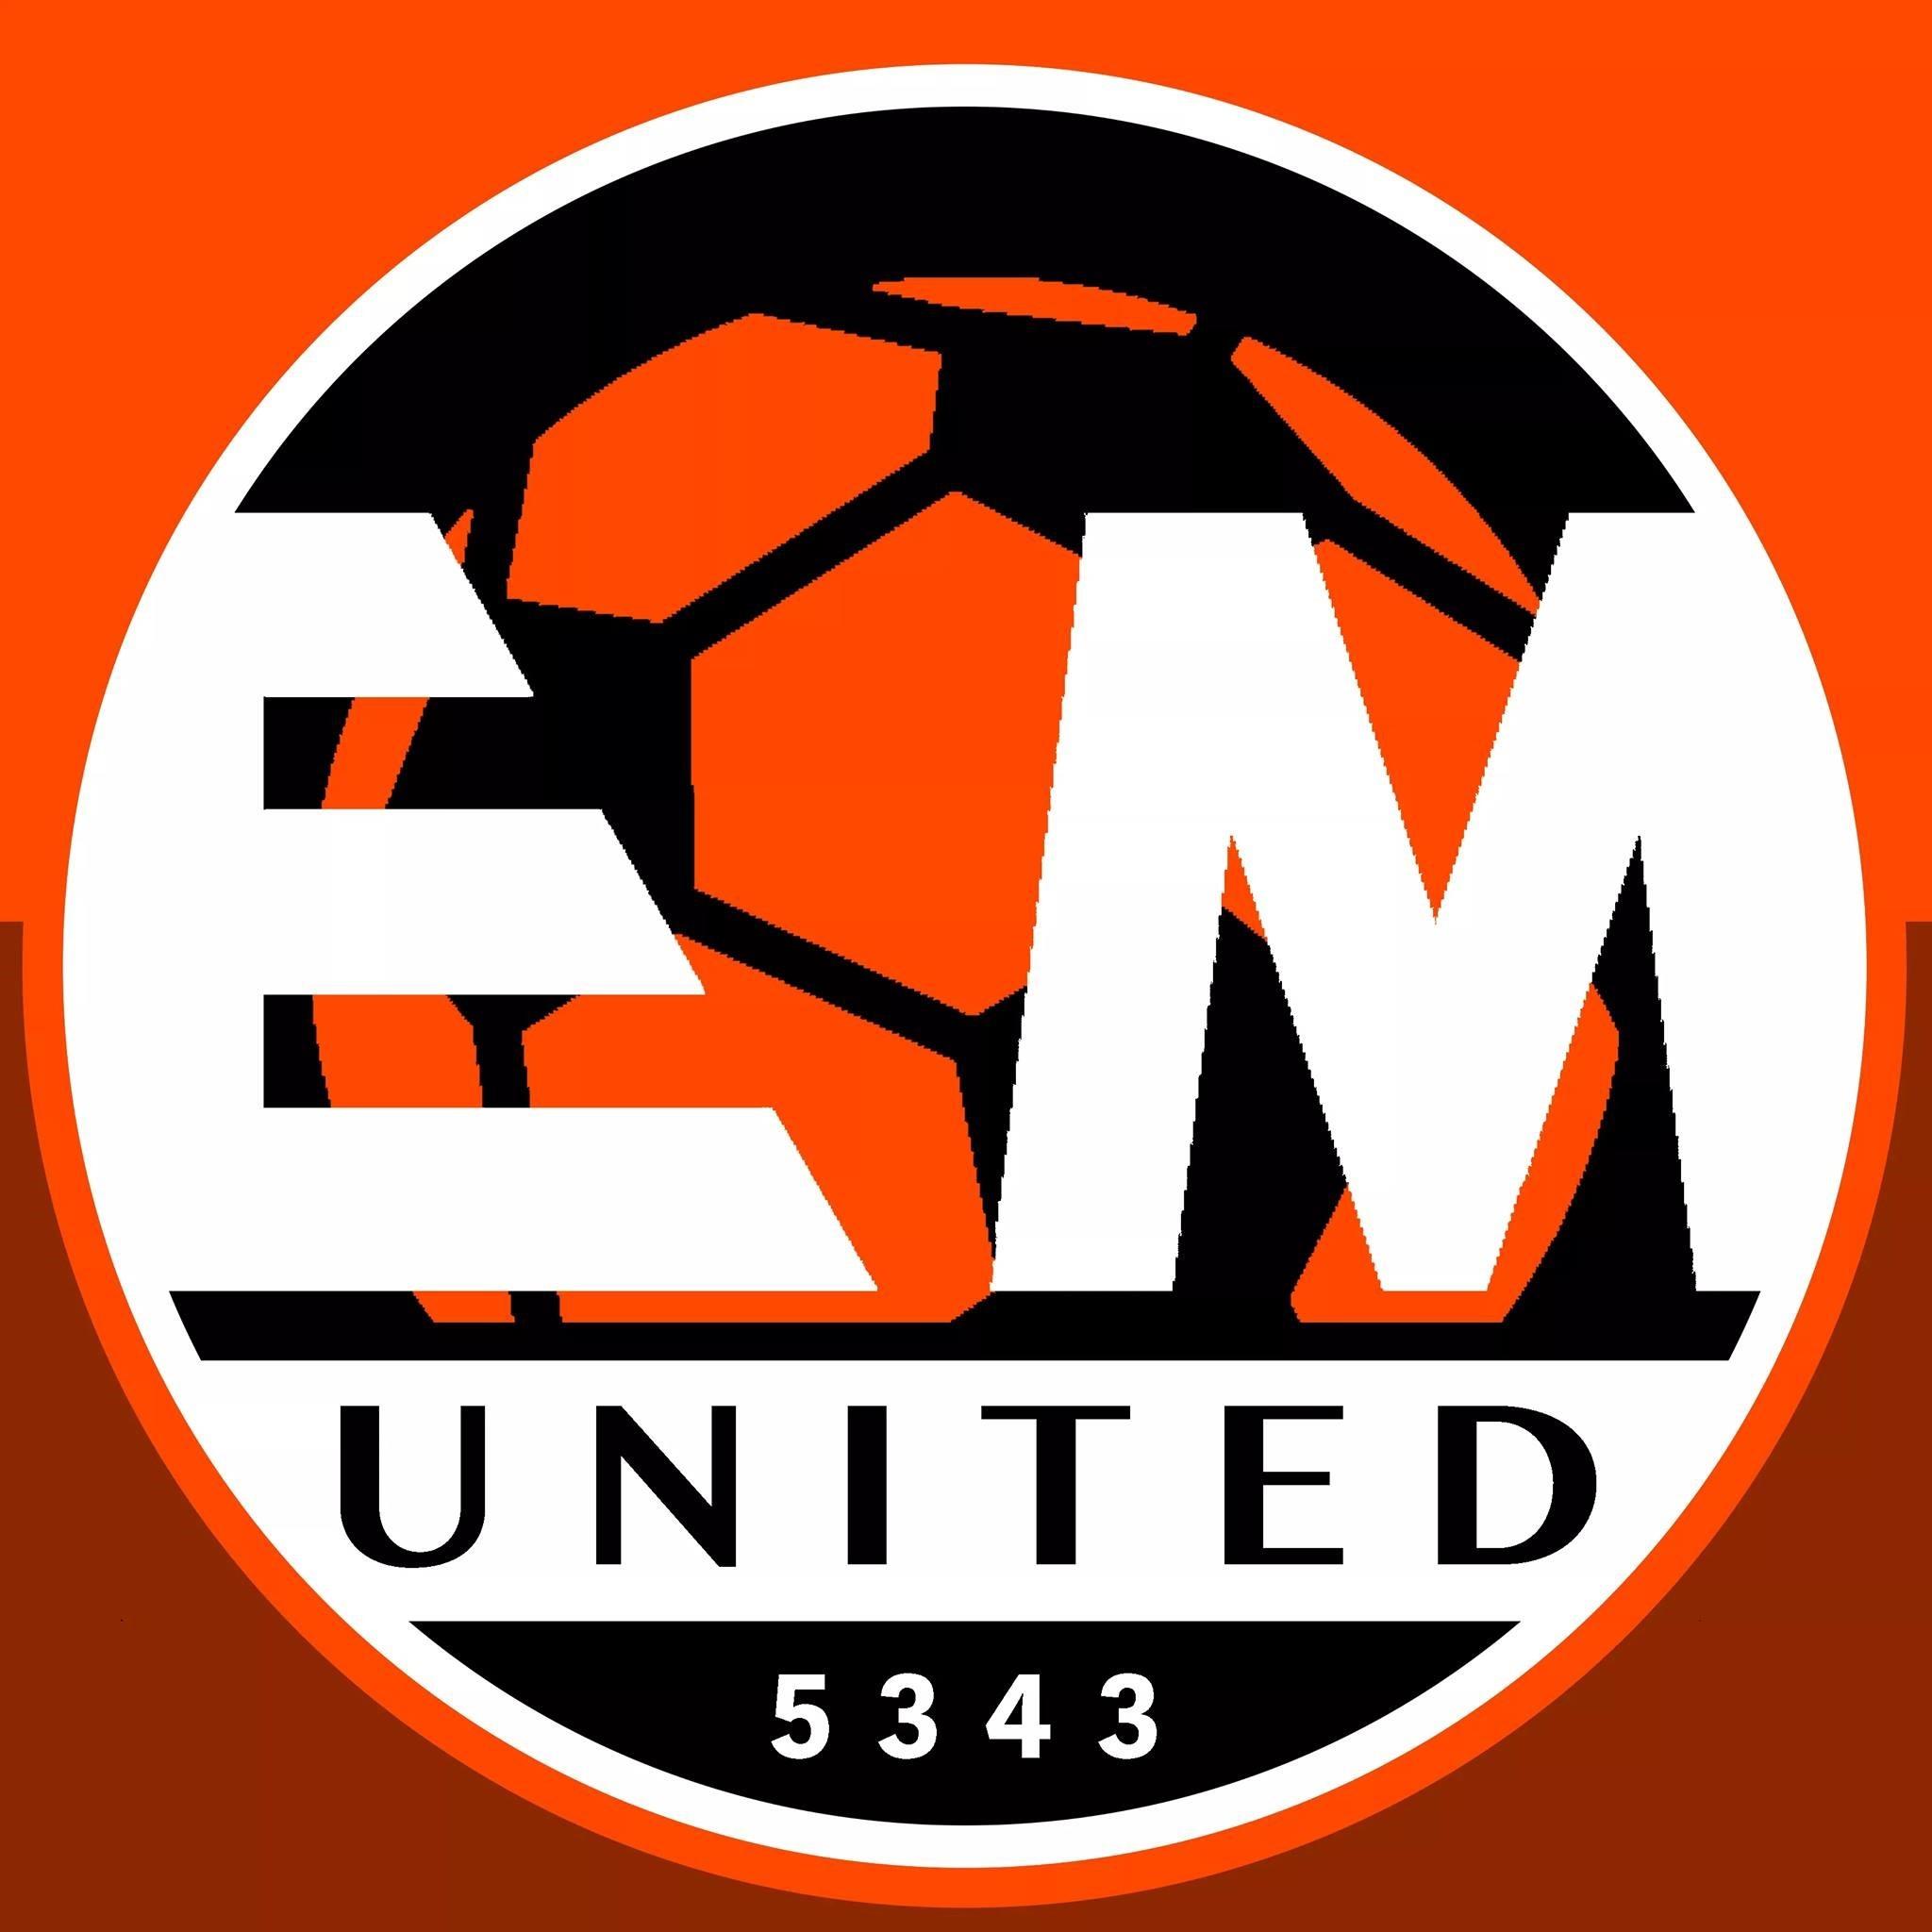 Erpe Mere United